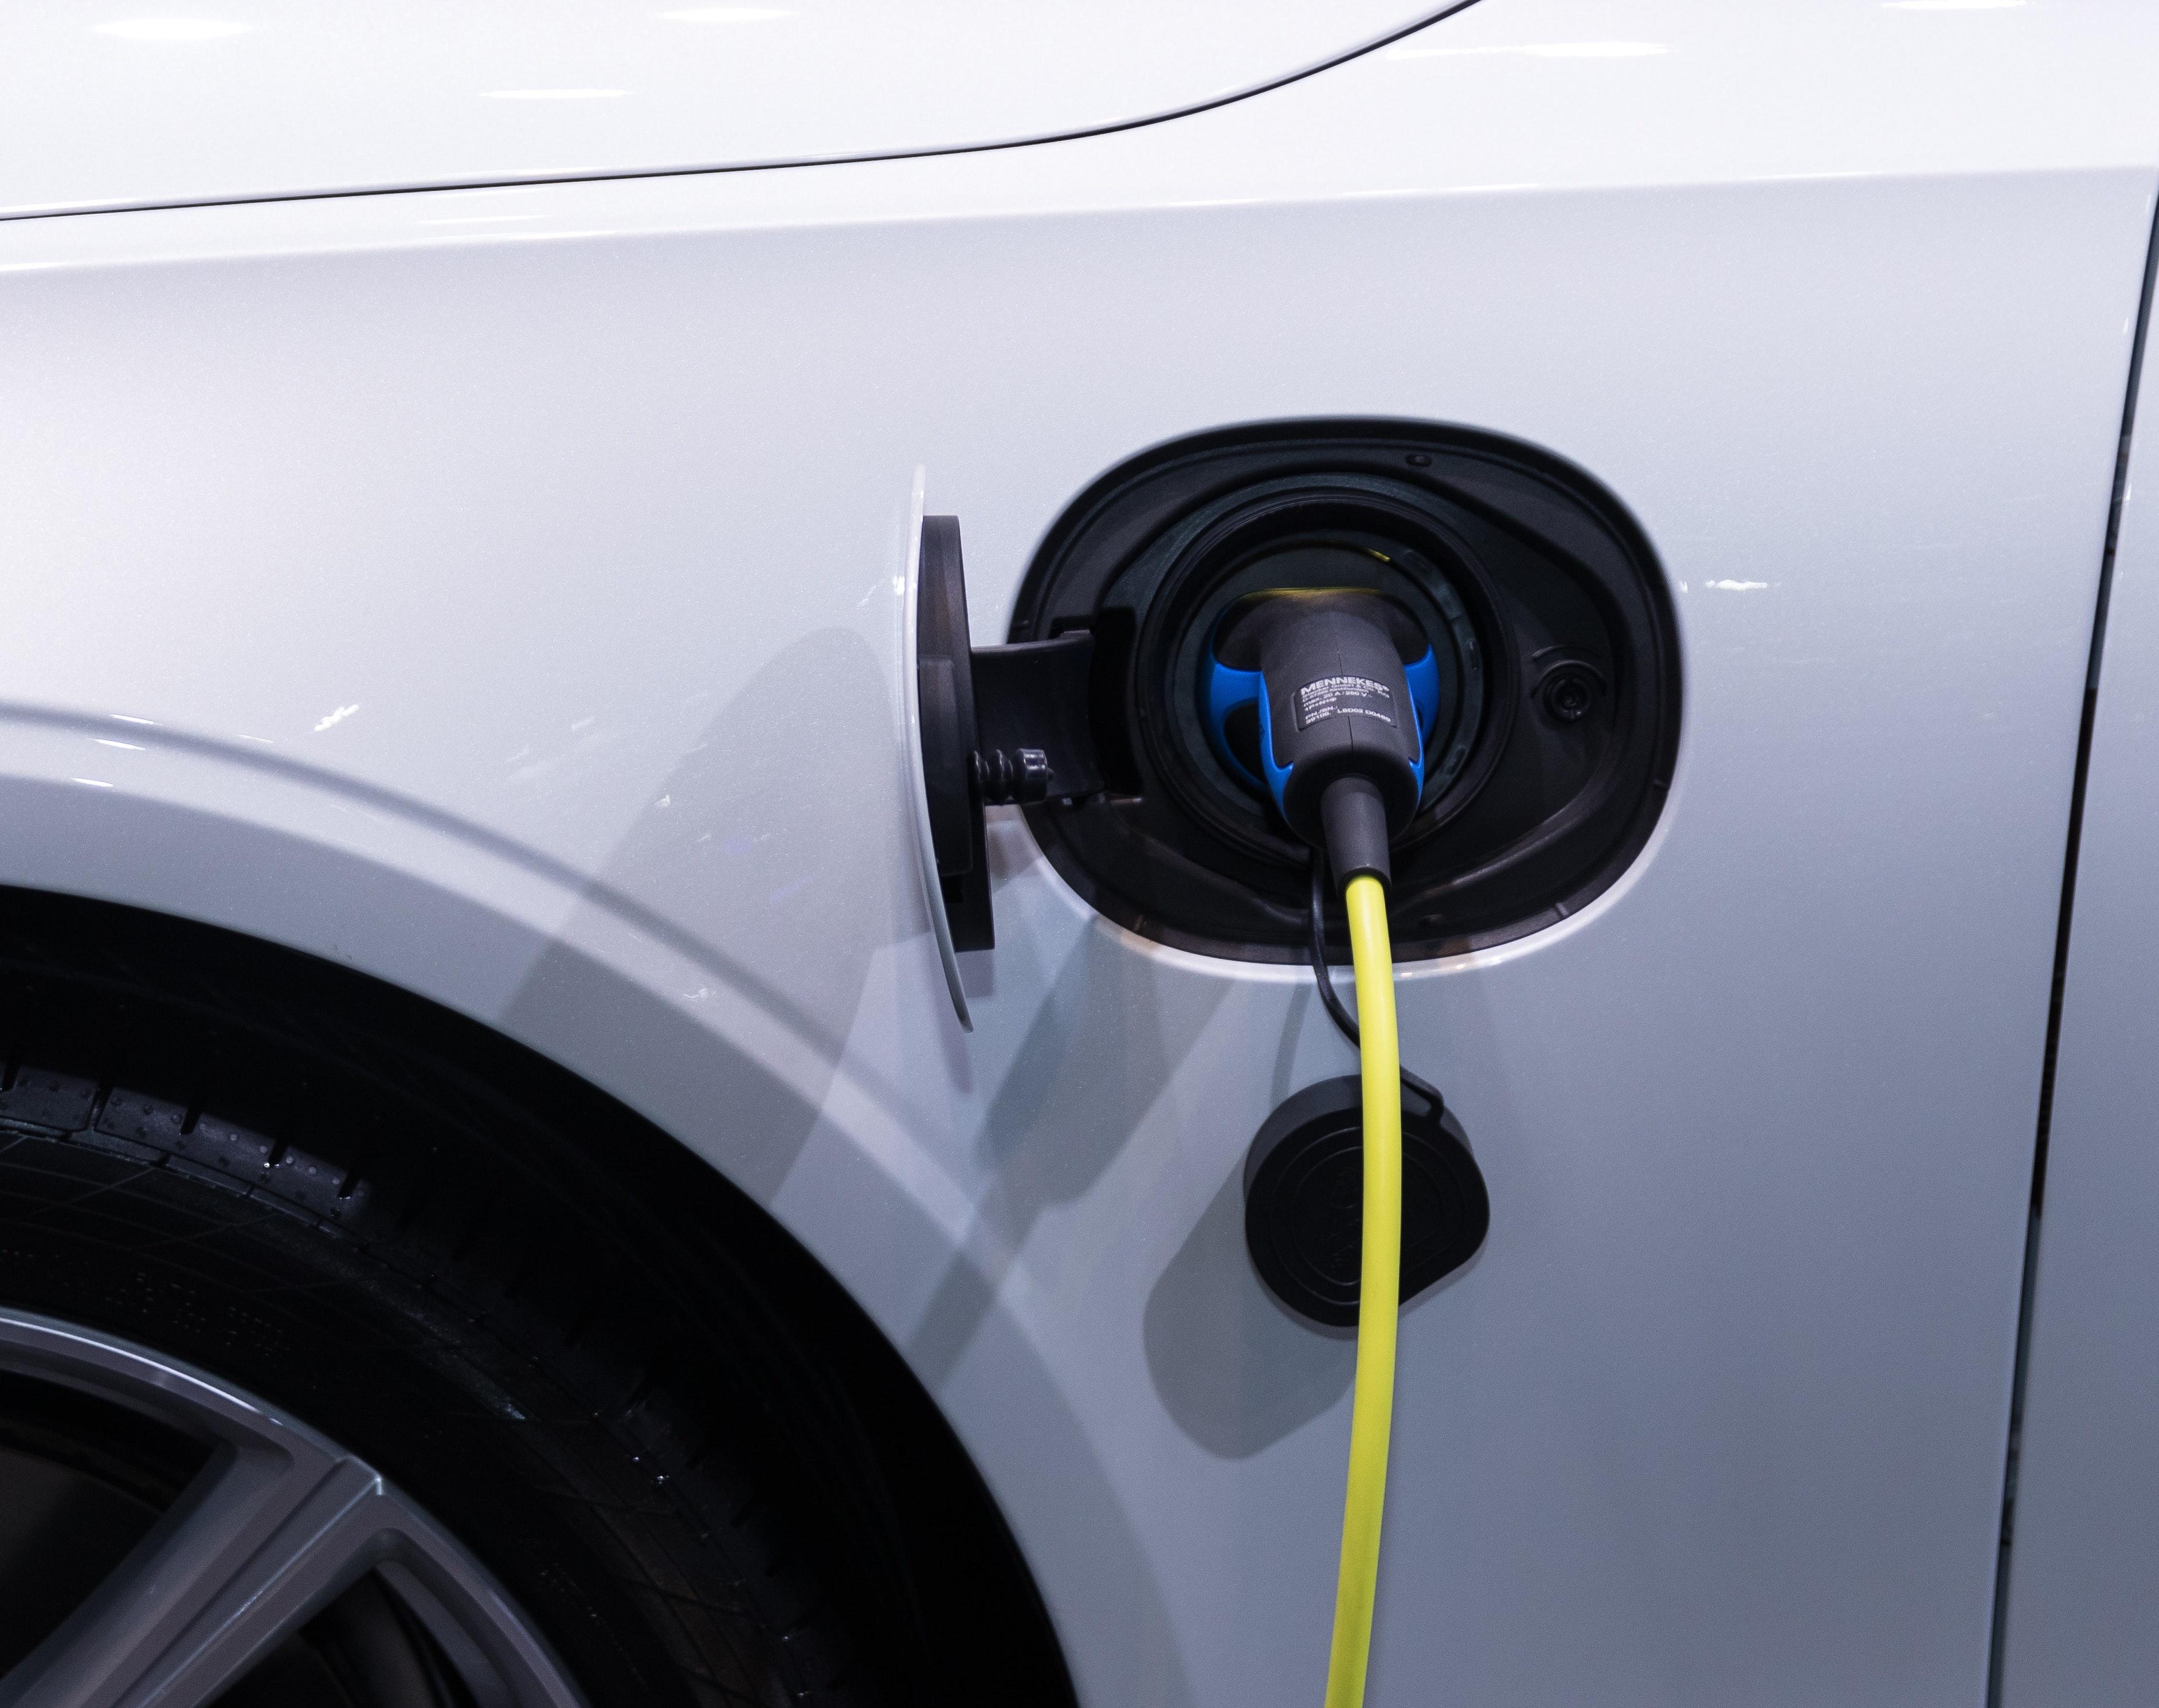 EV and EV Infrastructure